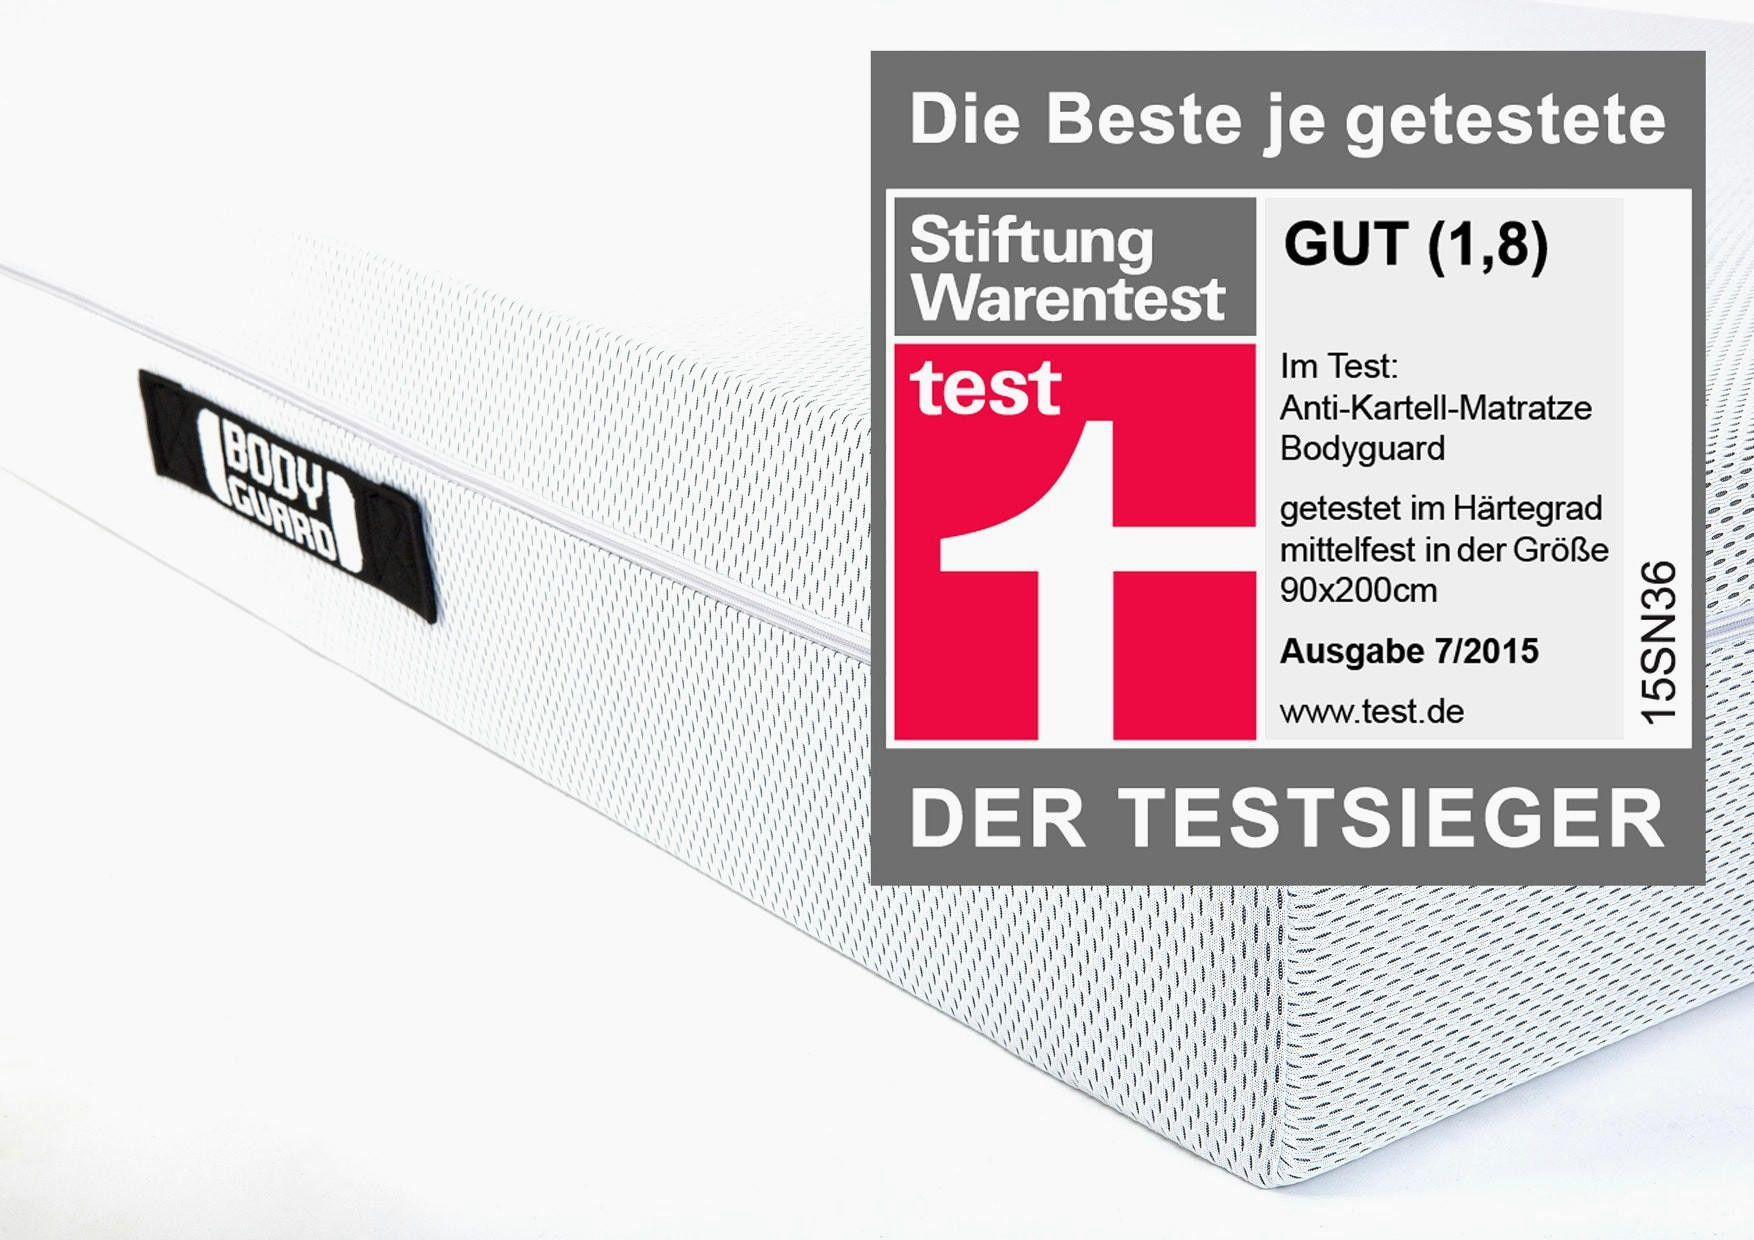 Matratzen Testsieger Elegant Matratzen Testsieger 2018 Einzigartig Stiftung Warentest In 2020 Matratze Beste Matratze Babymatratze